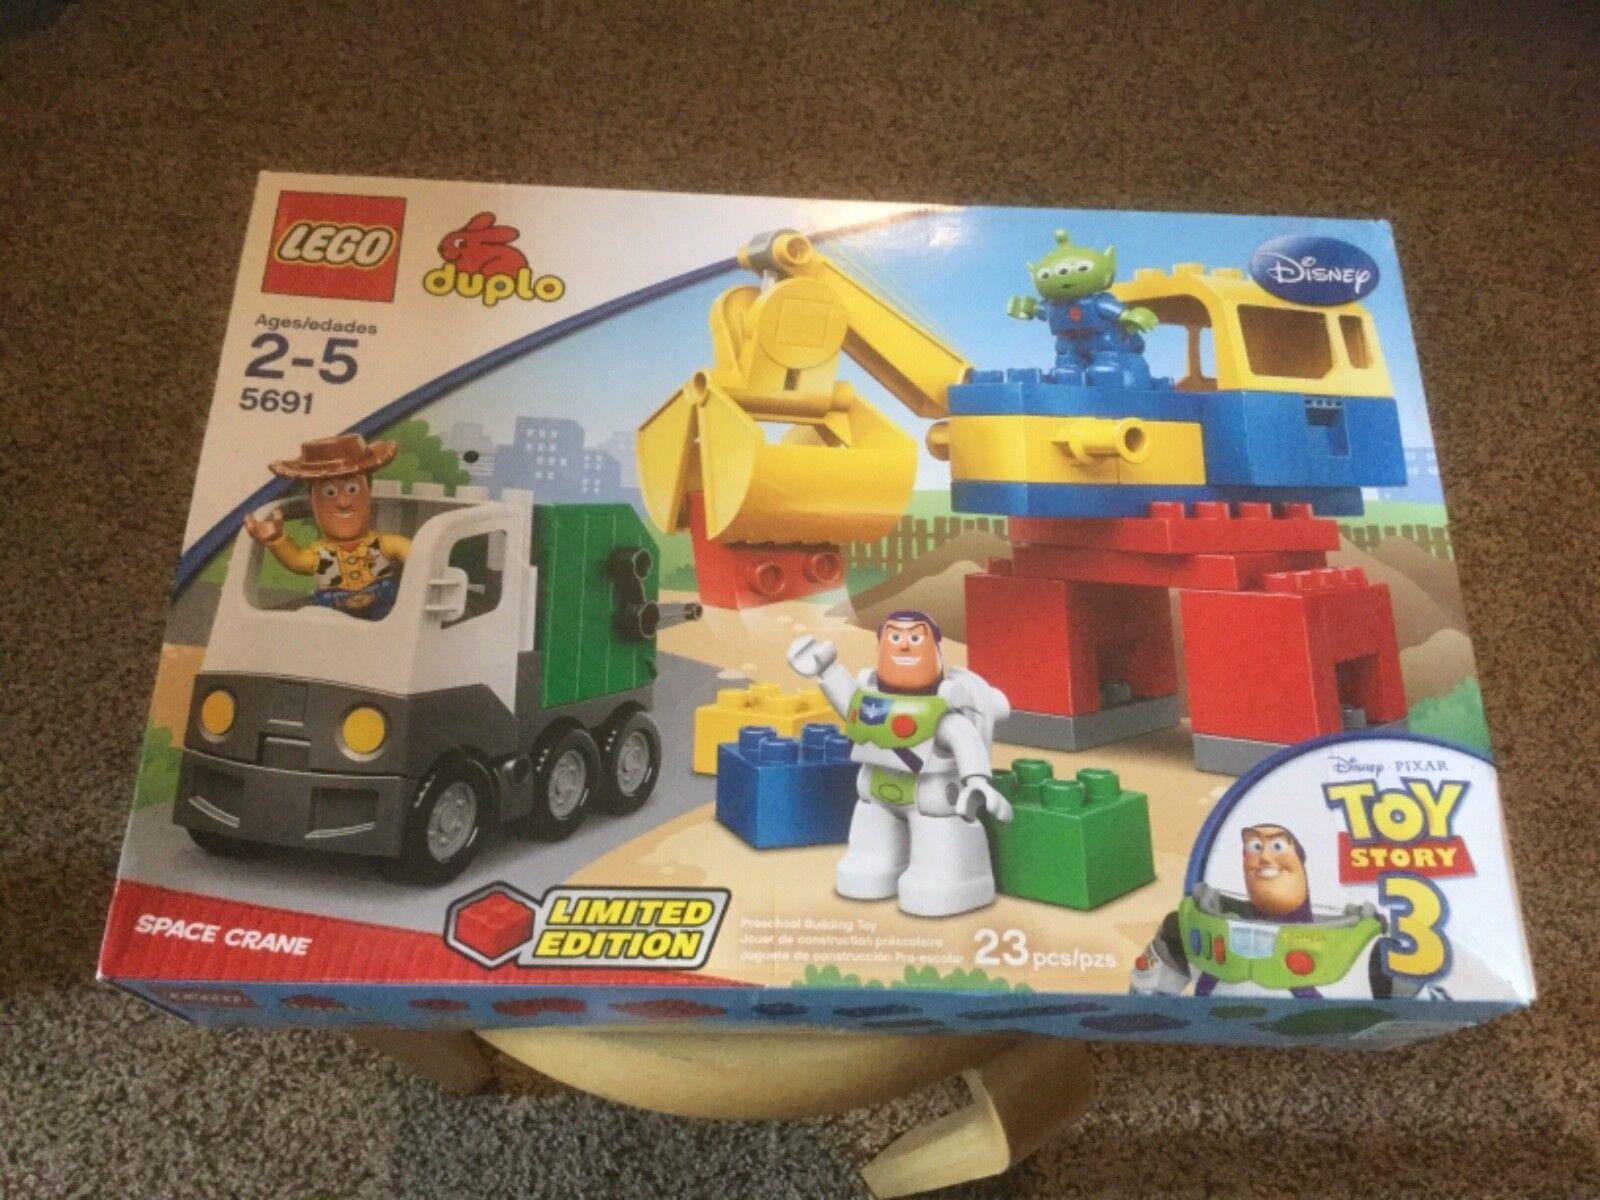 NIB Lego Alien Space Crane (5691). Box shows some wear.